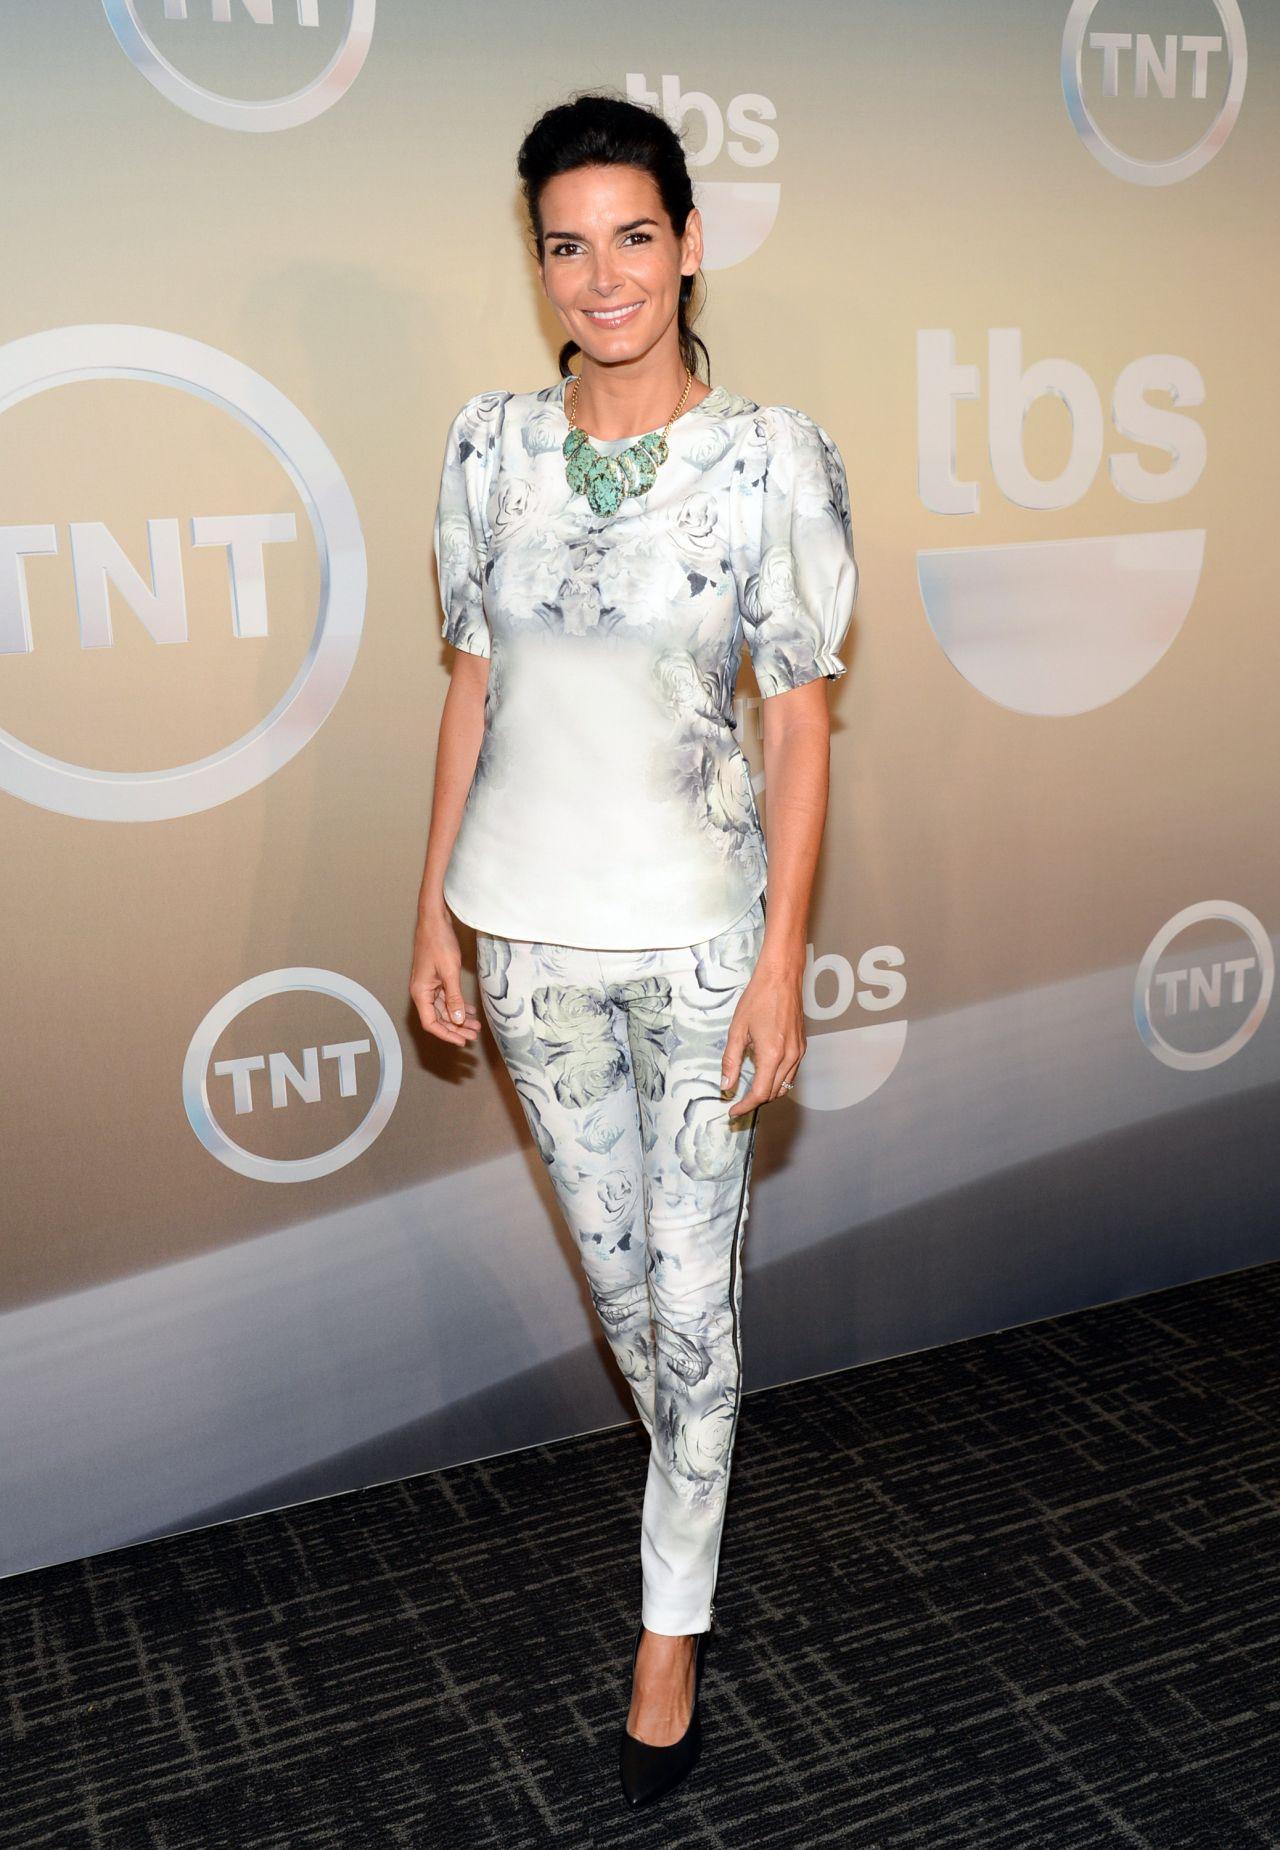 Angie Harmon Wearing Katharine Kidd at TBS & TNT Upfront 2014